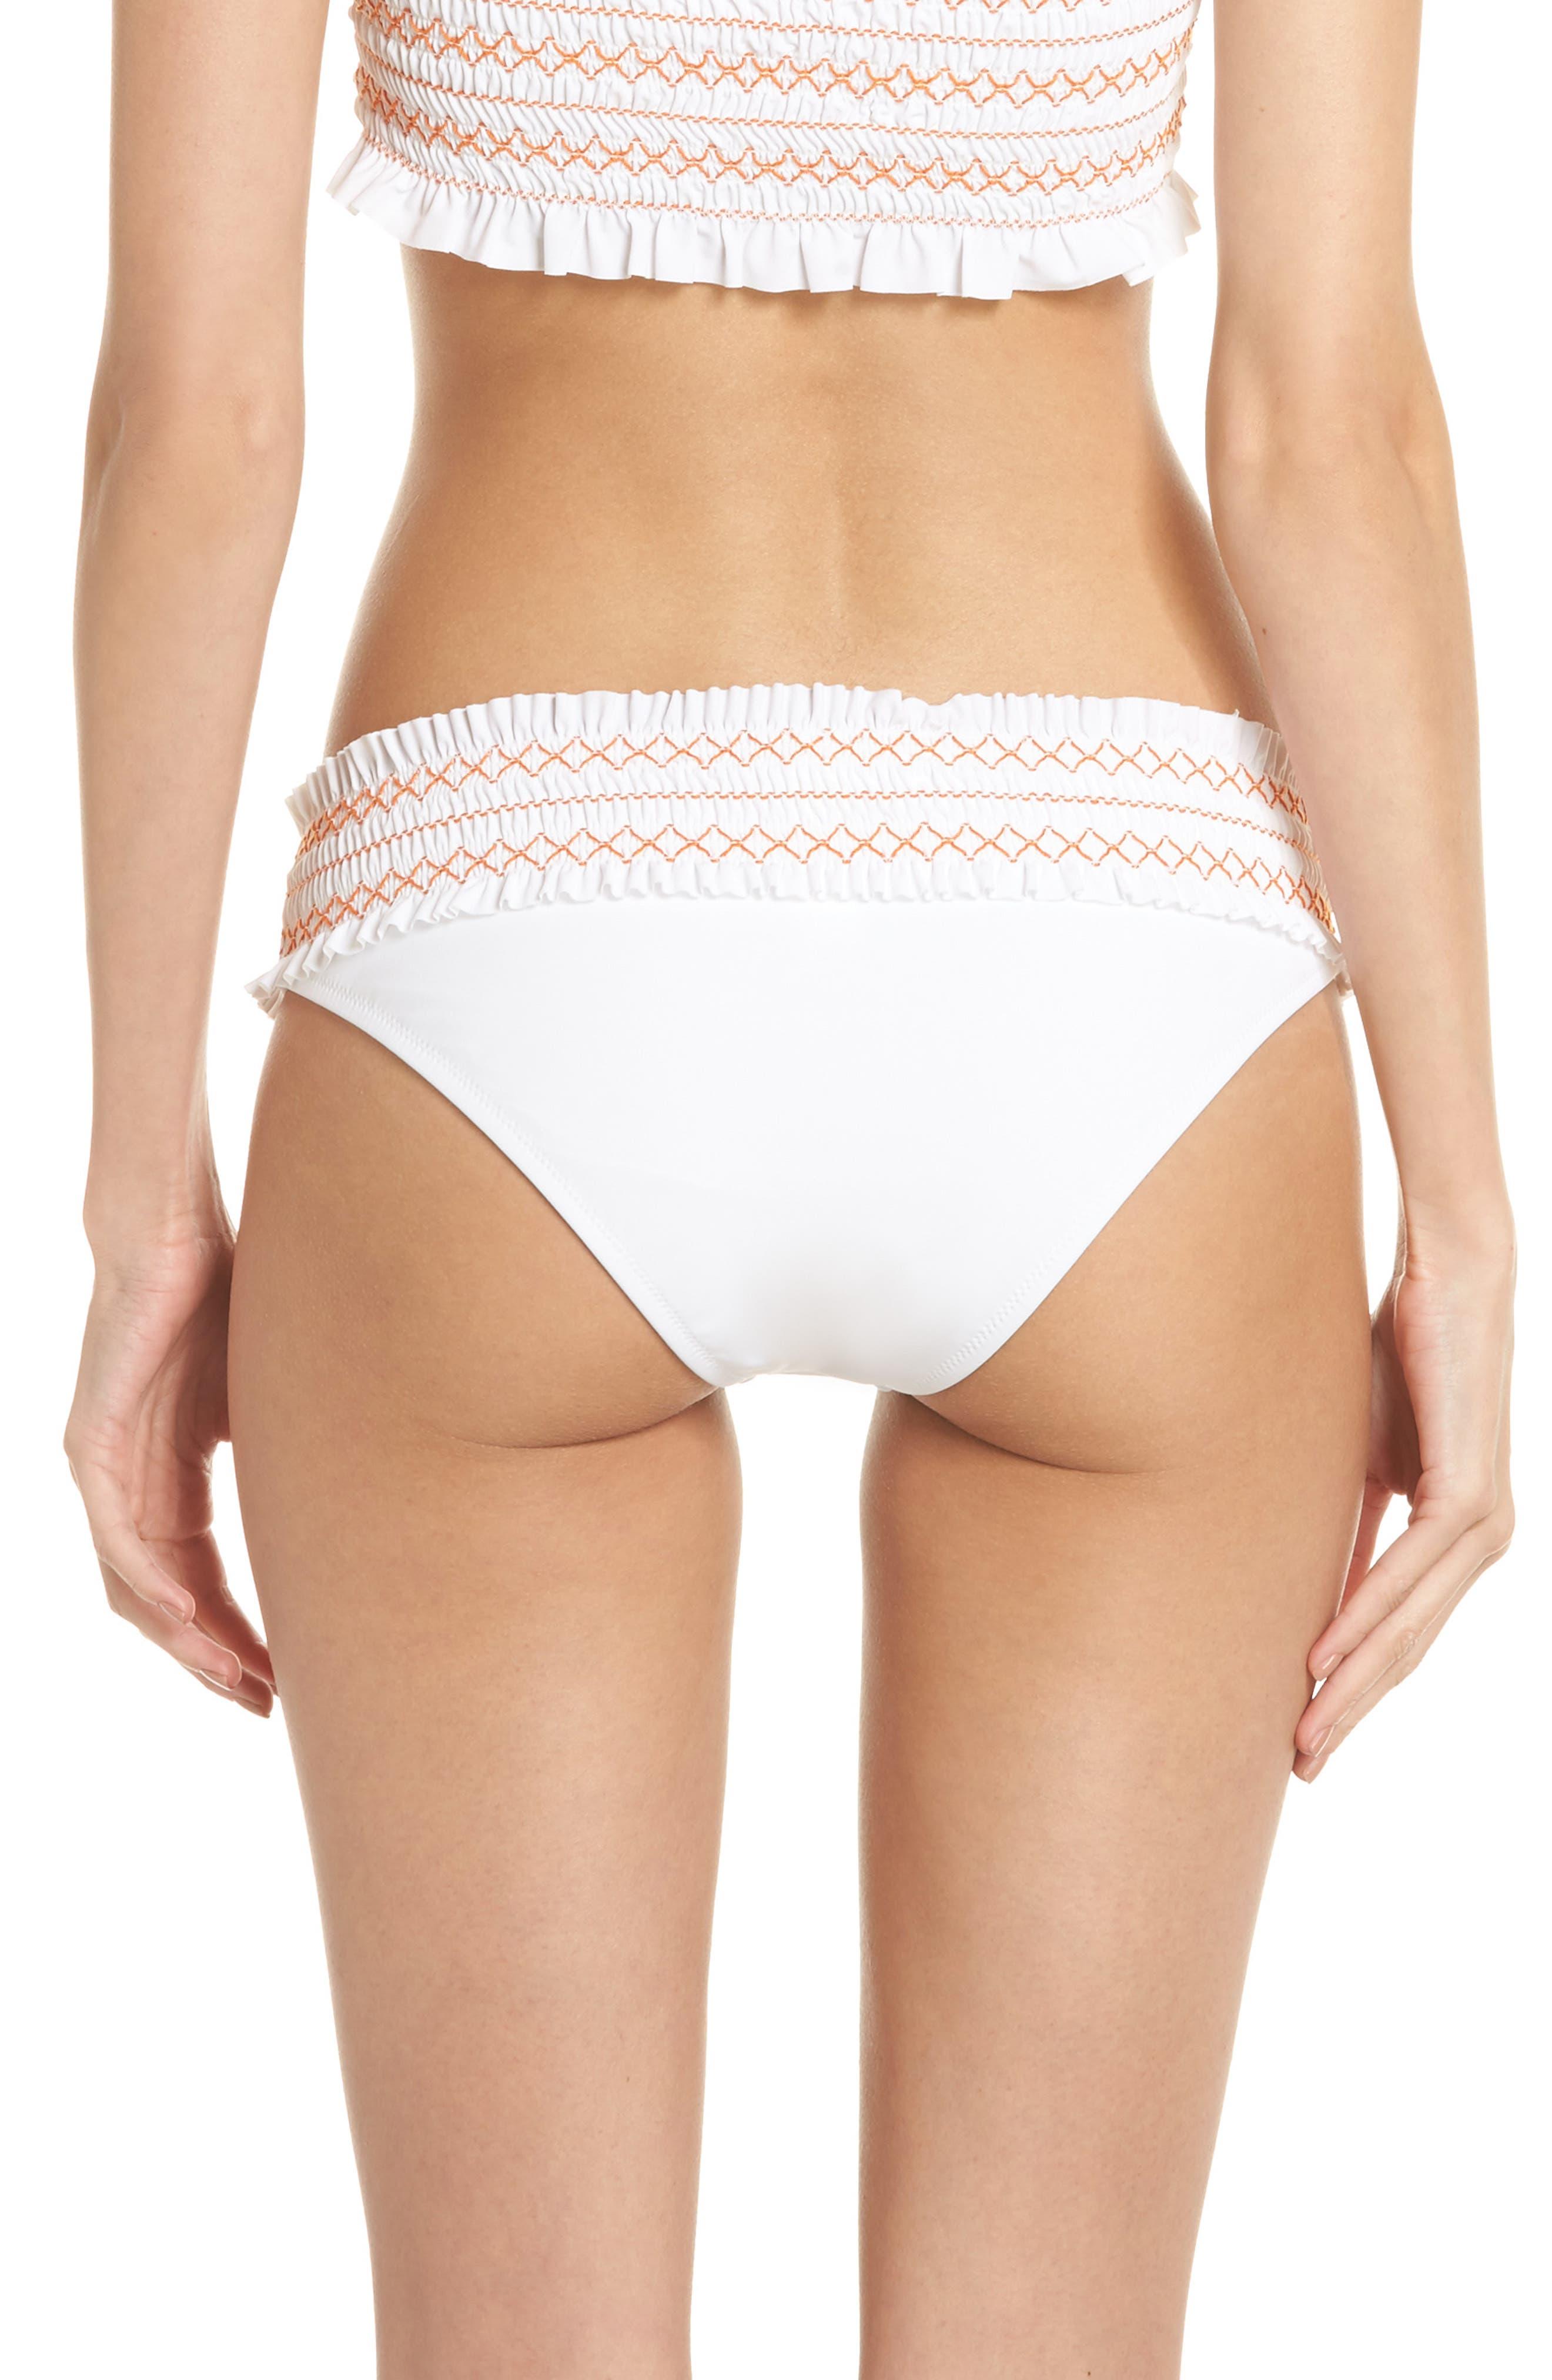 Alternate Image 2  - Tory Burch Costa Smocked Hipster Bikini Bottoms